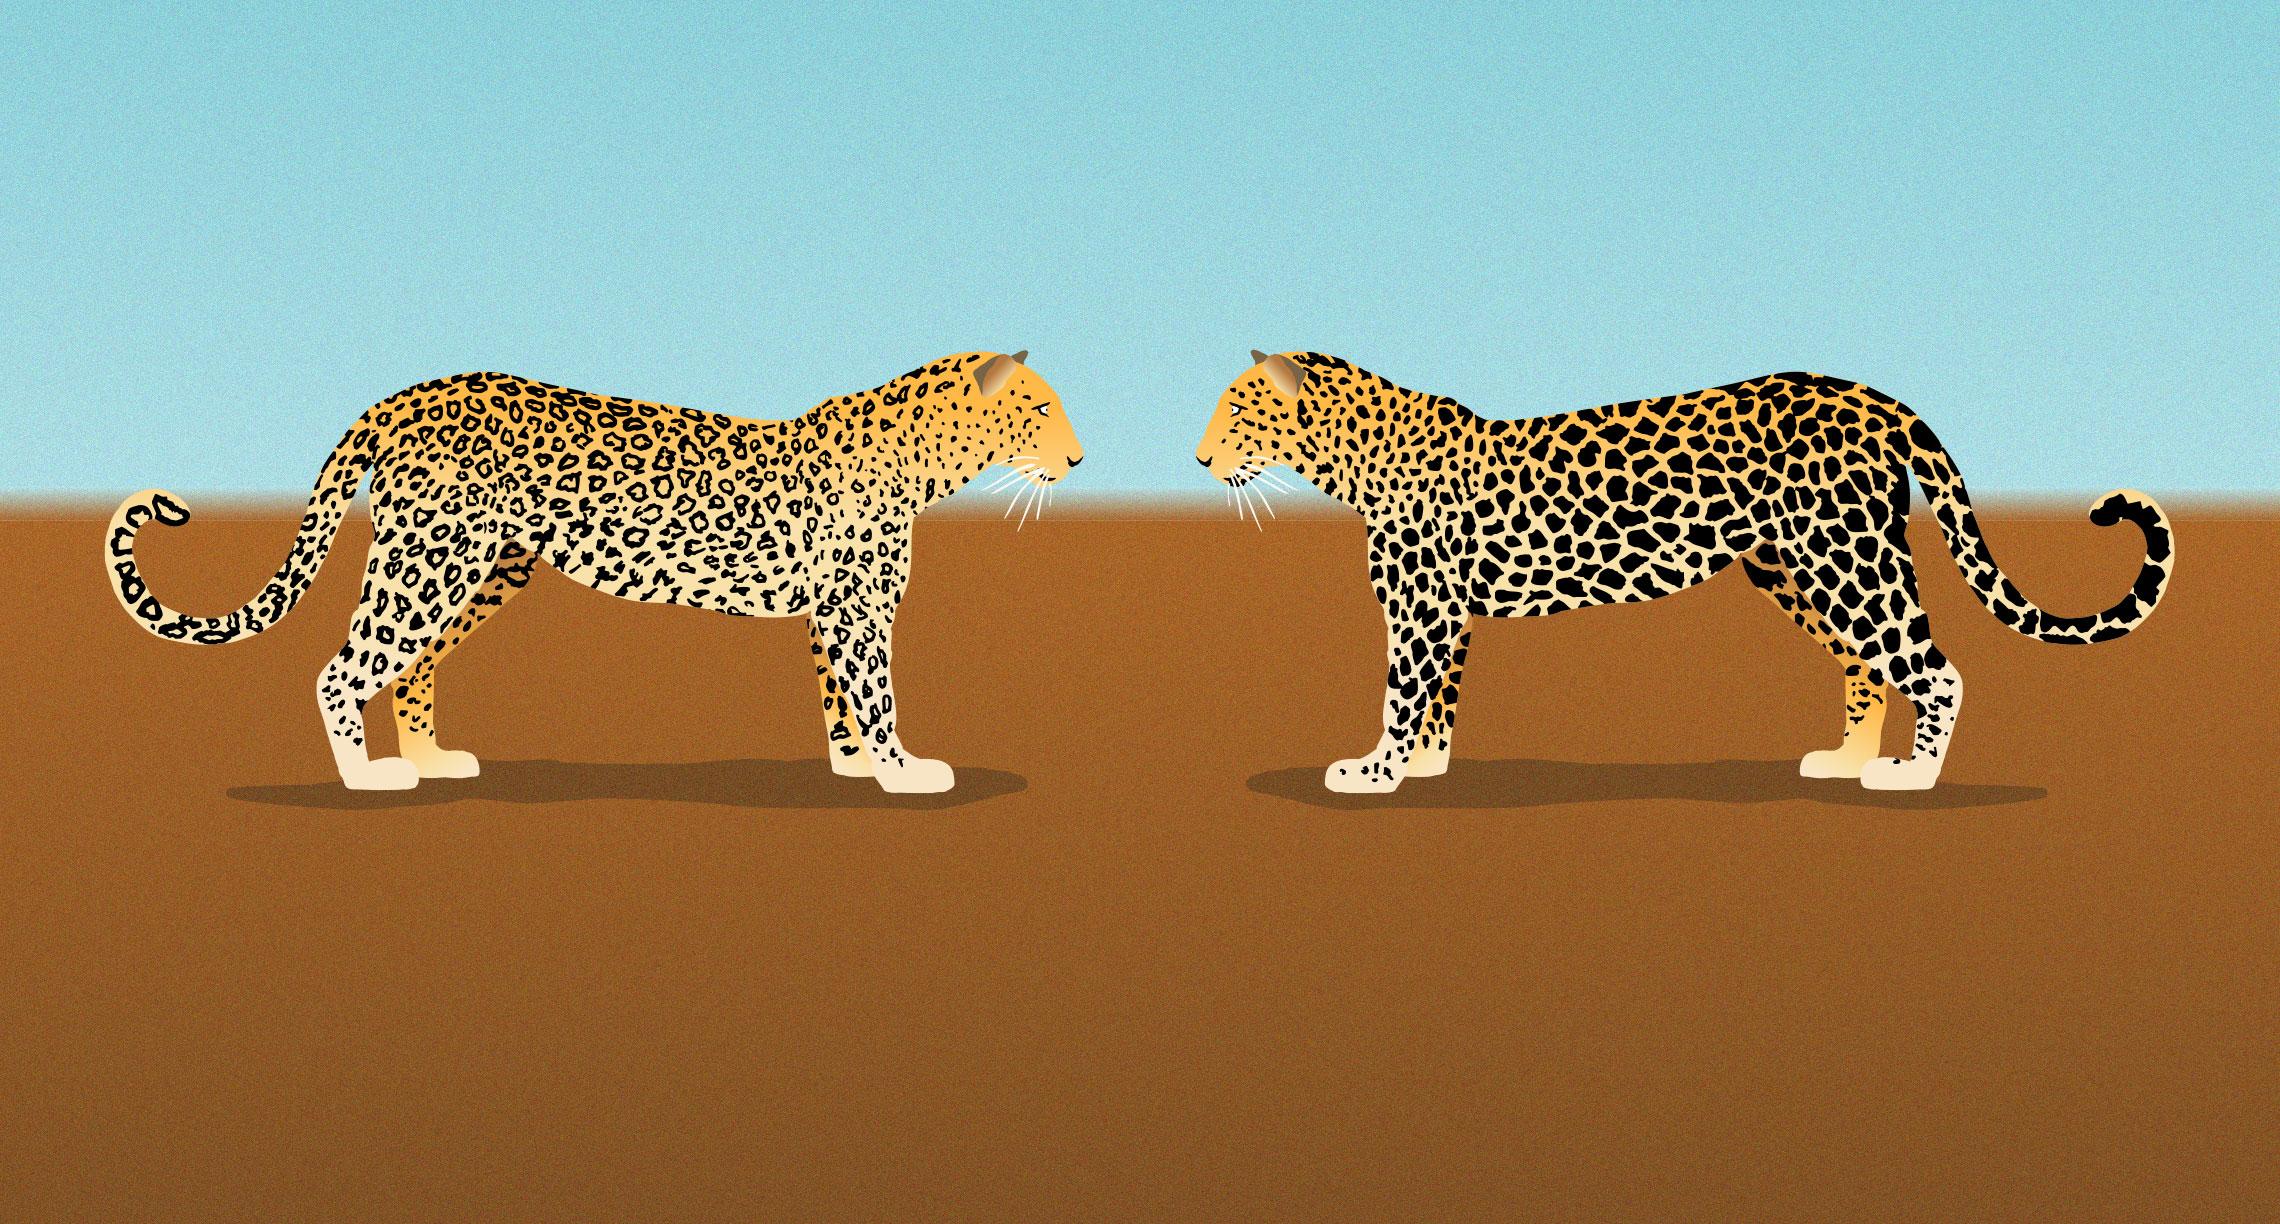 Leopard changing it's spots illustration